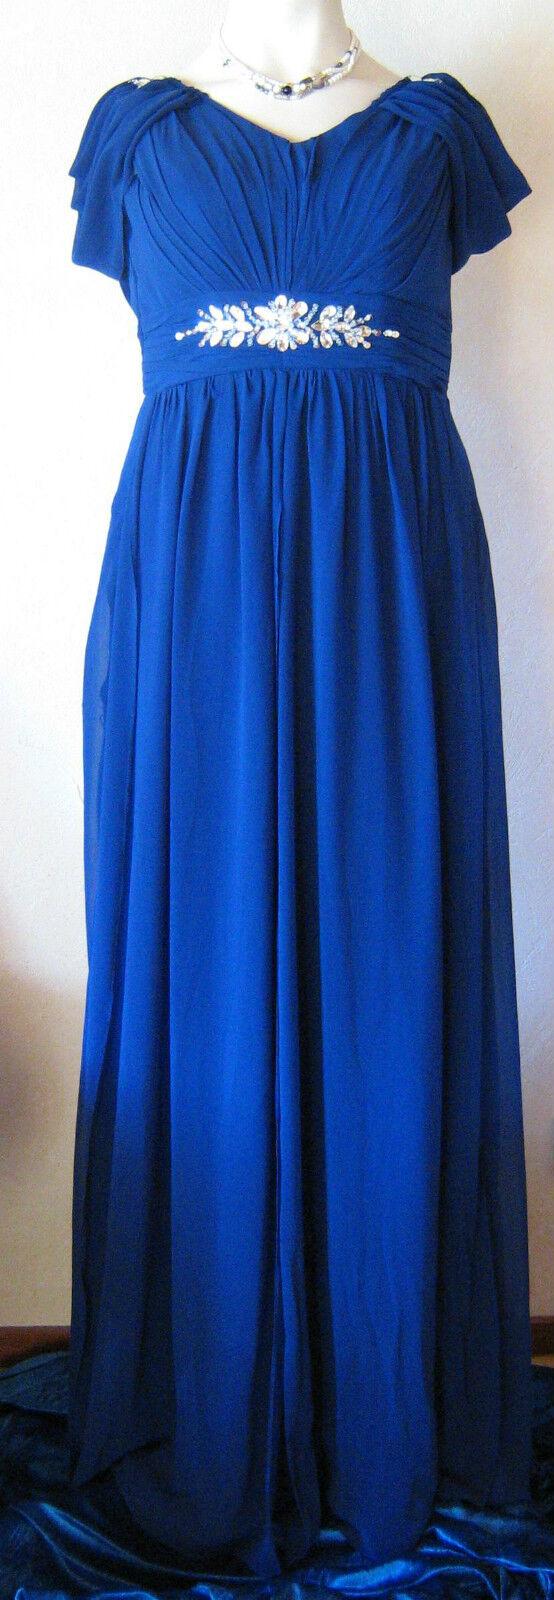 Abendkleid - royalblau - Gr. 44